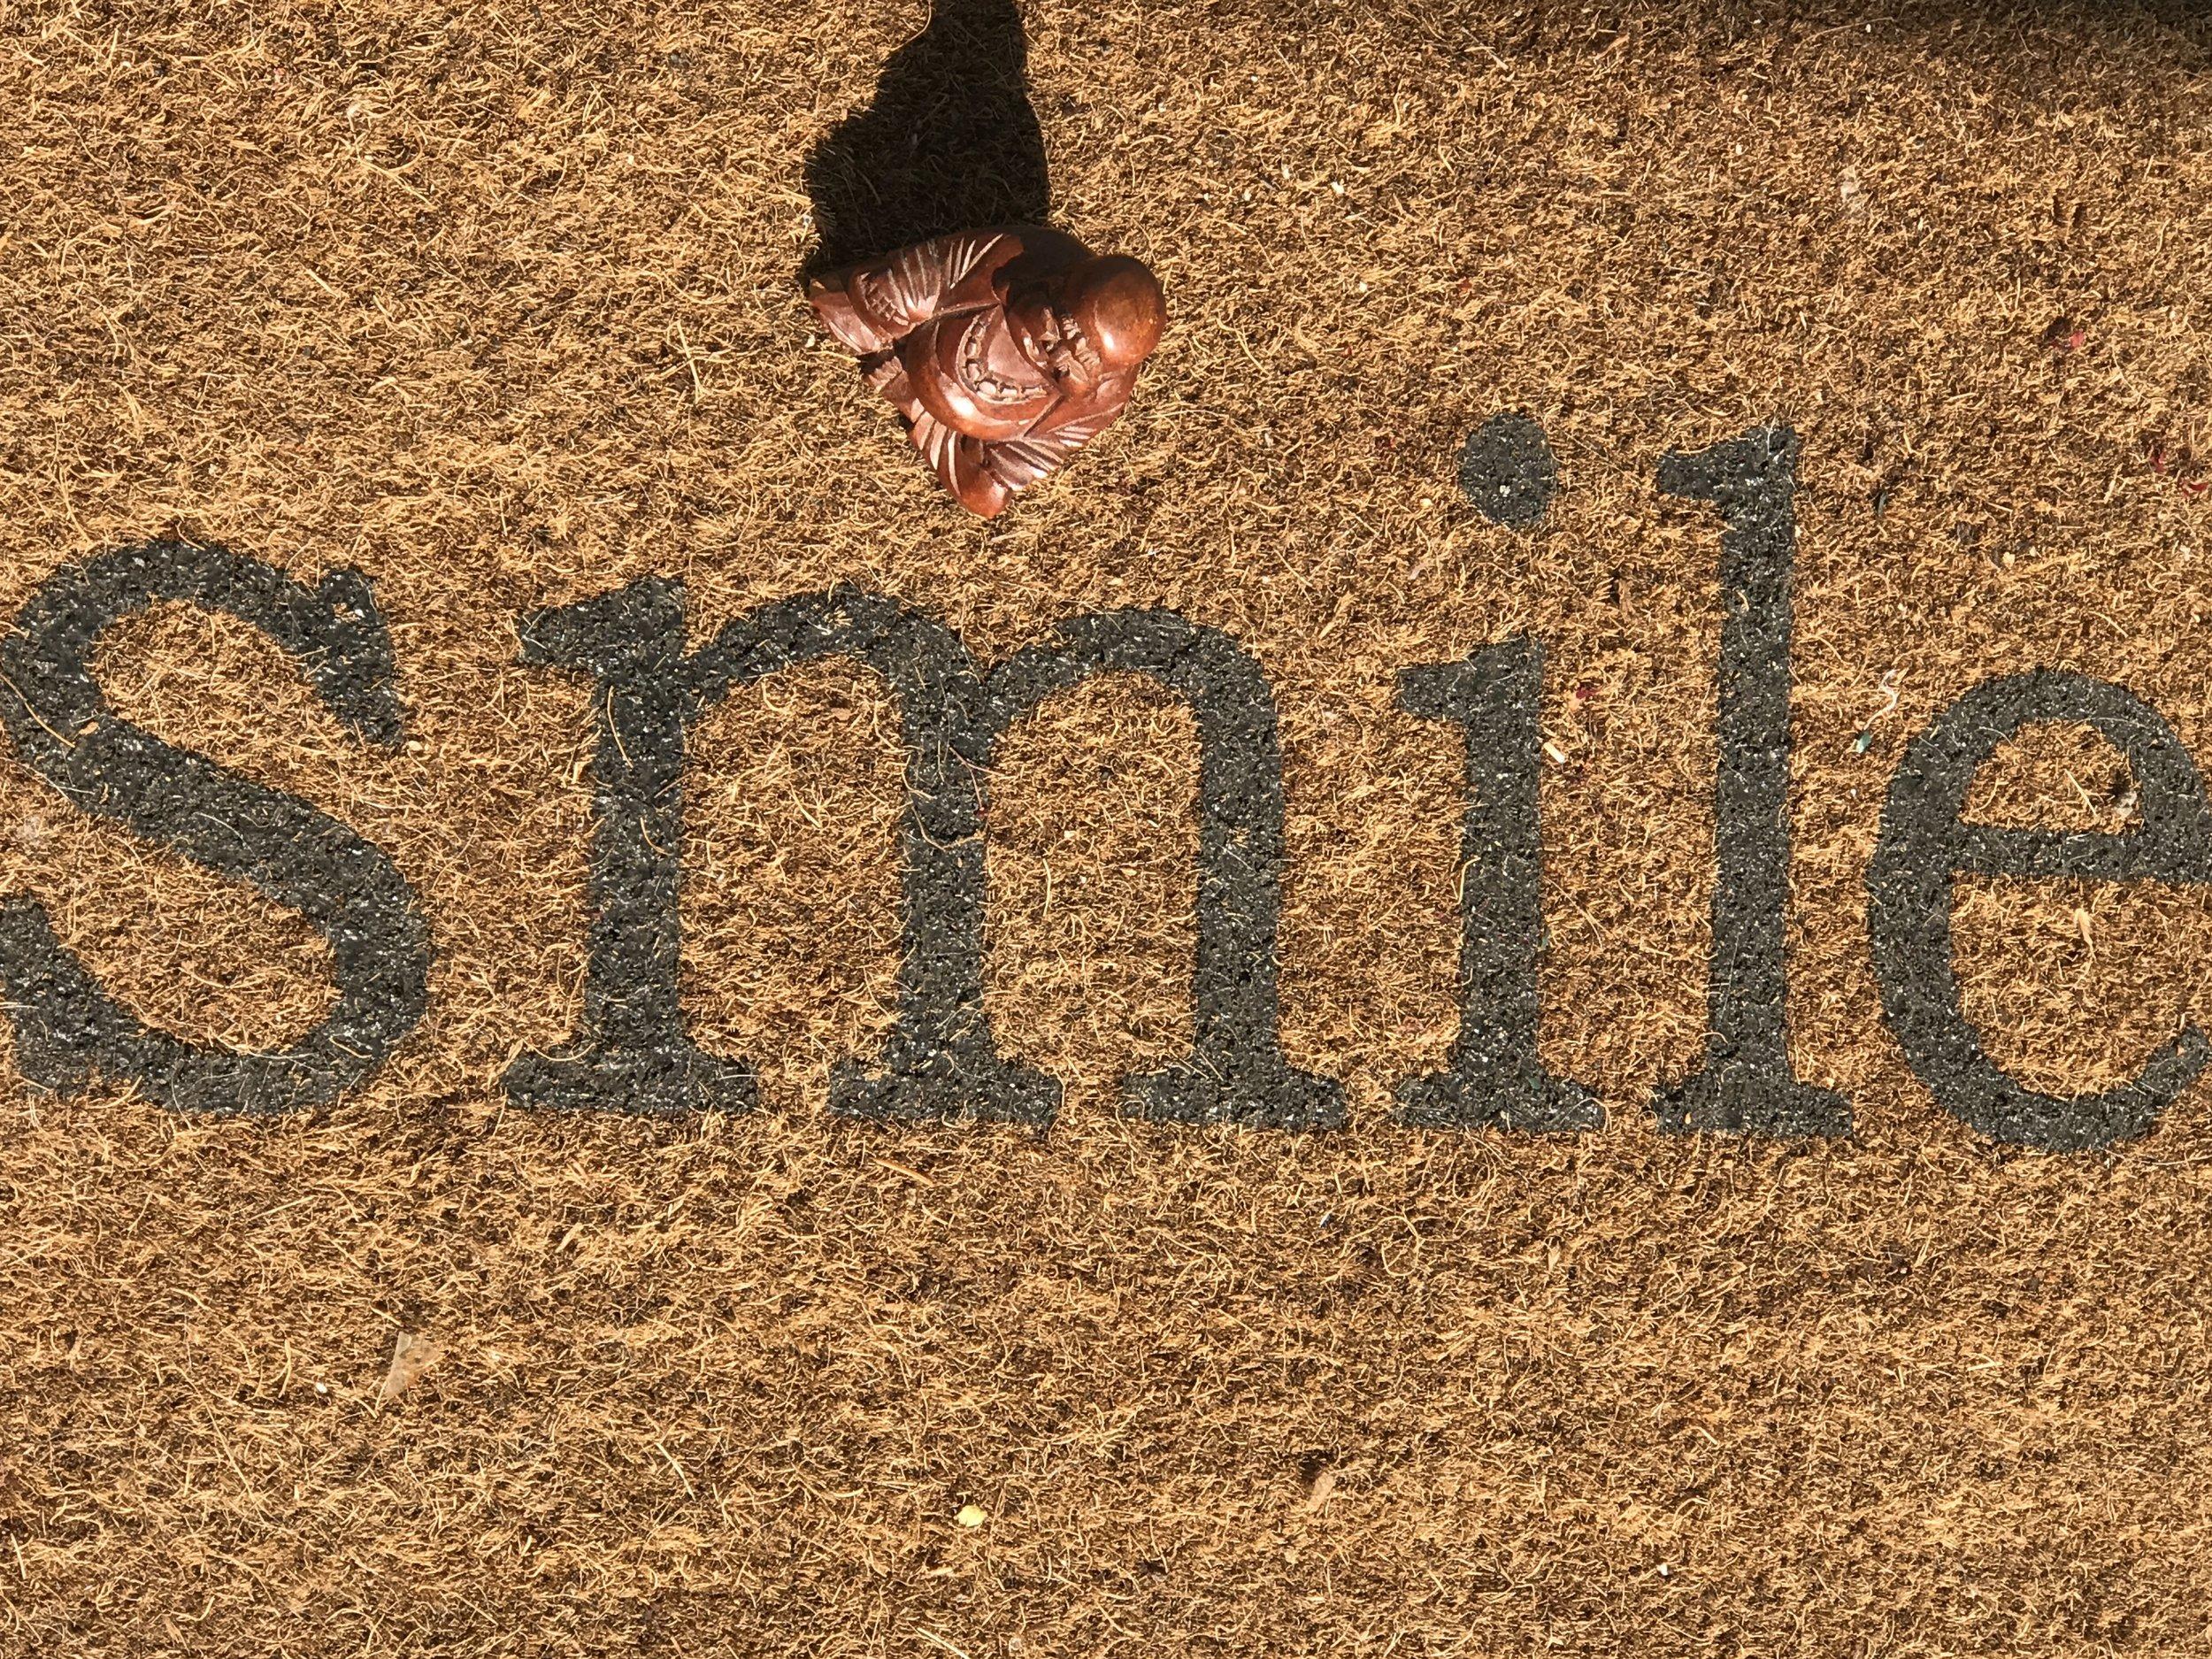 """Buddha smiles"" copyright 2019 Cleveland Edits"